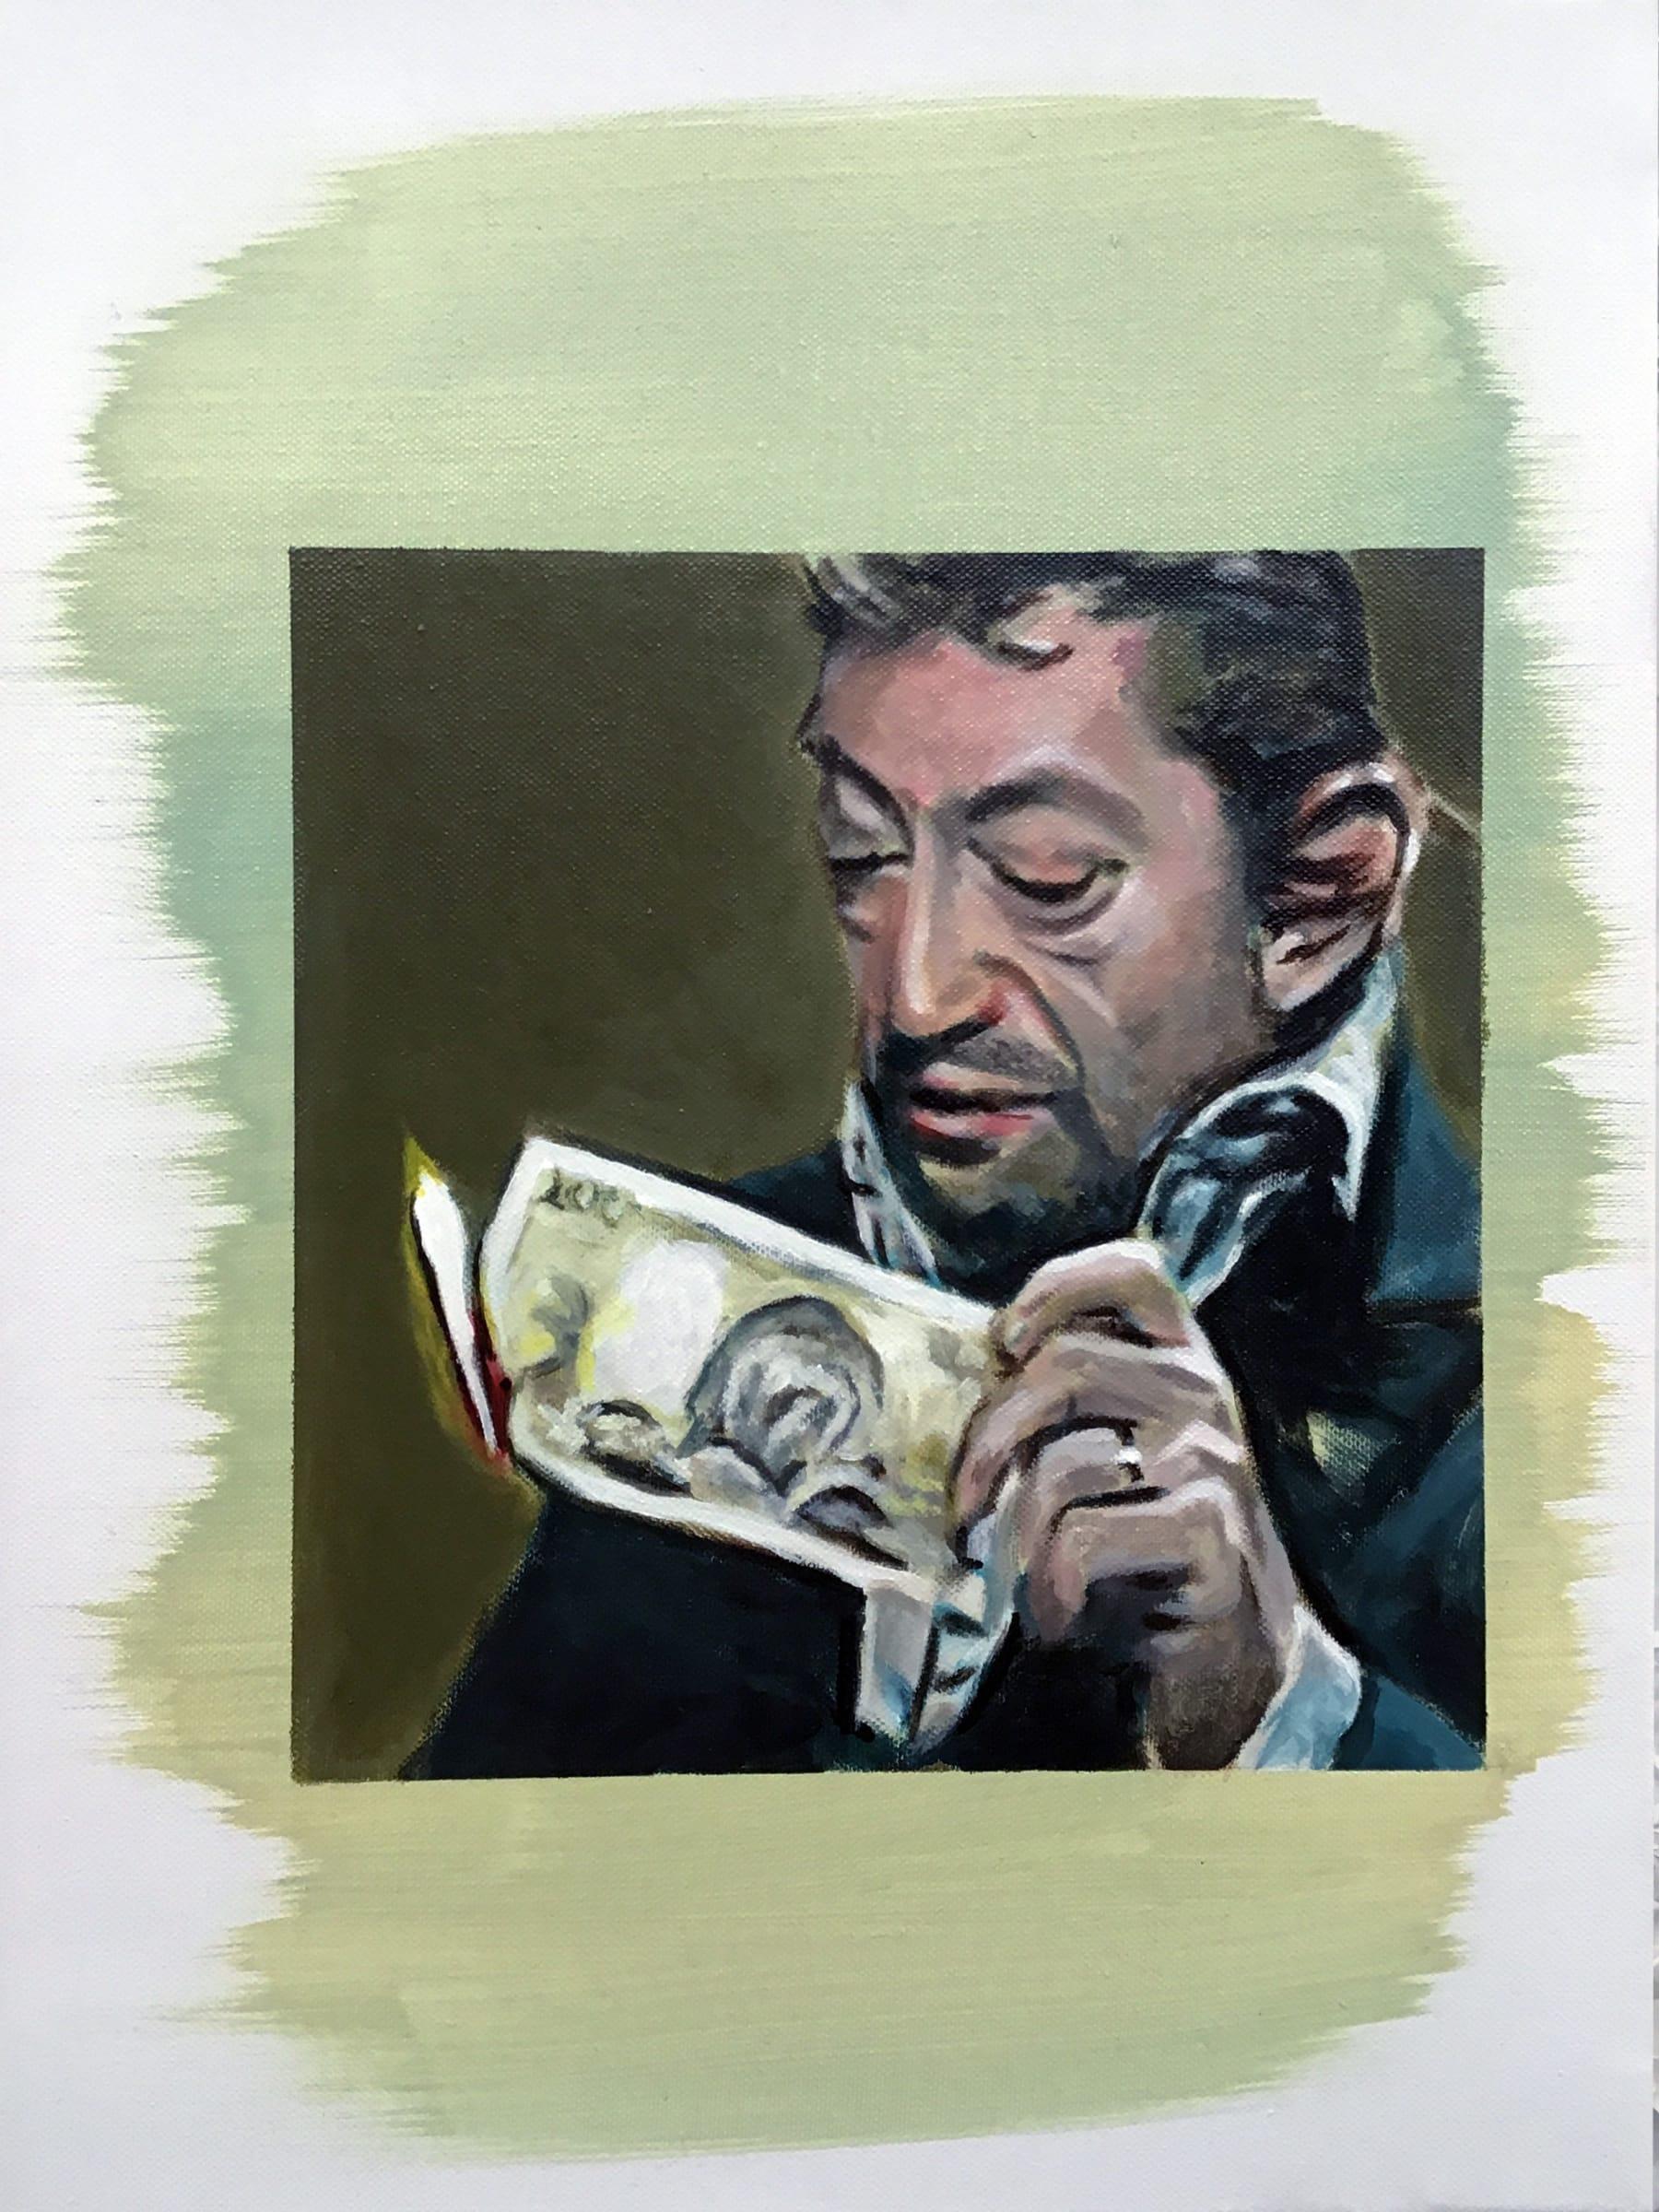 "<span class=""link fancybox-details-link""><a href=""/exhibitions/91/works/artworks11239/"">View Detail Page</a></span><div class=""artist""><strong>Filip MARKIEWICZ</strong></div><div class=""title""><em>Gainsbourg</em>, 2019</div><div class=""signed_and_dated"">Signed & dated</div><div class=""medium"">Oil on canvas</div><div class=""dimensions"">56 x 41 cm<br>22 1/8 x 16 1/8 in</div>"